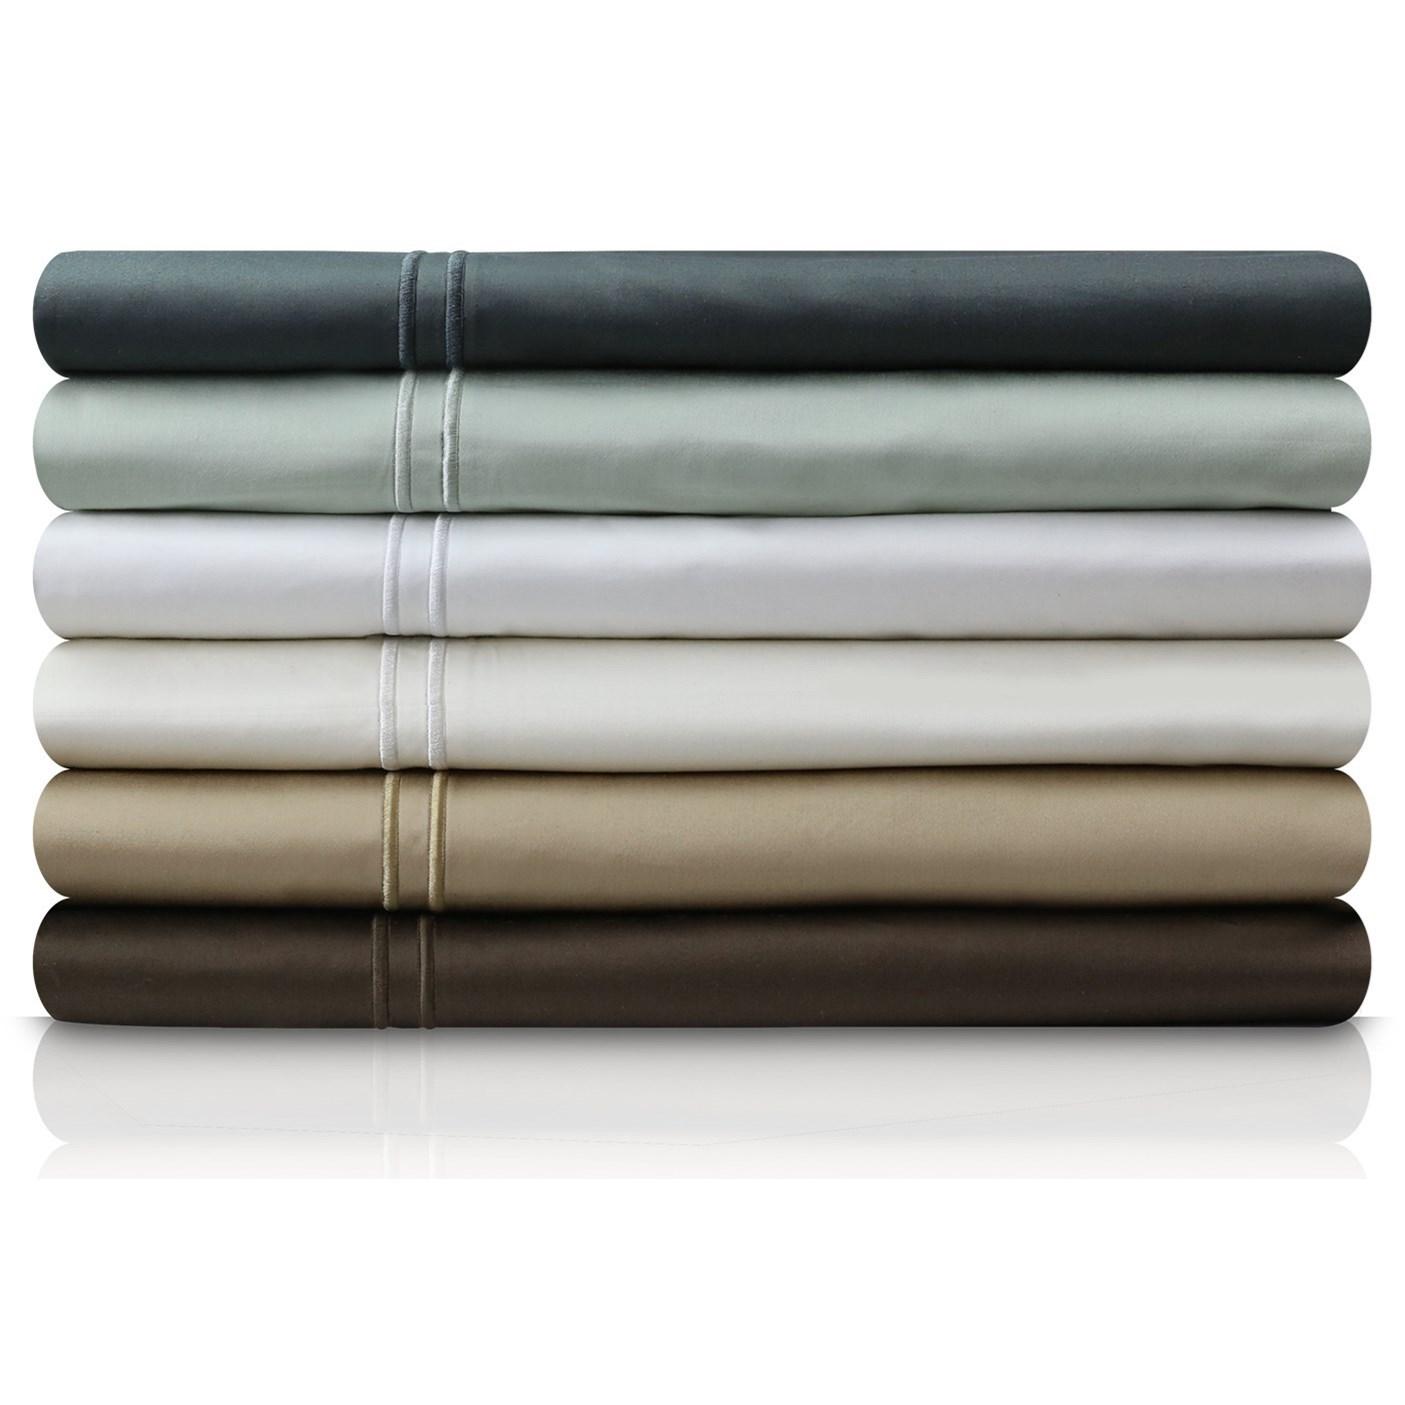 Malouf Egyptian Cotton Full XL 600 TC Egyptian Cotton Sheet Set - Item Number: MA06FXKHSS